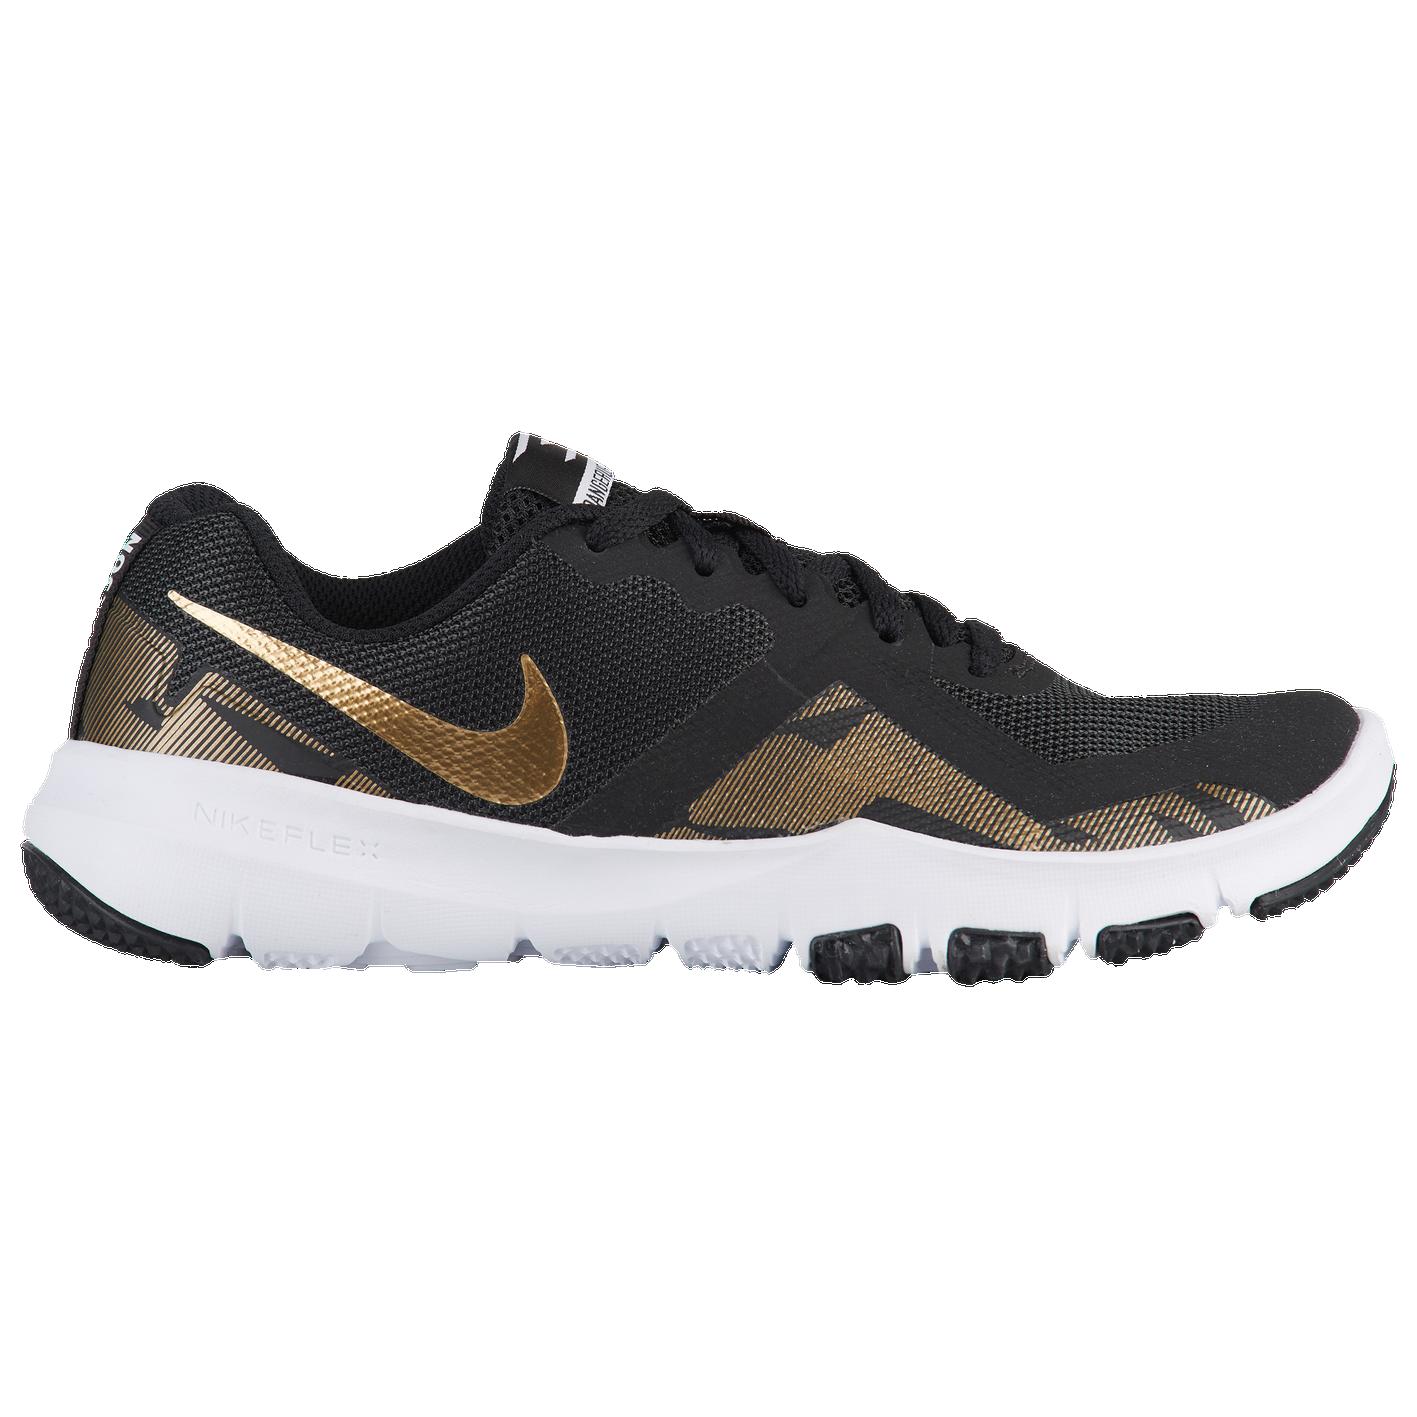 promo code 32d38 b46b9 Nike Flex Control II - Boys' Grade School - Running - Shoes - Wilson ...